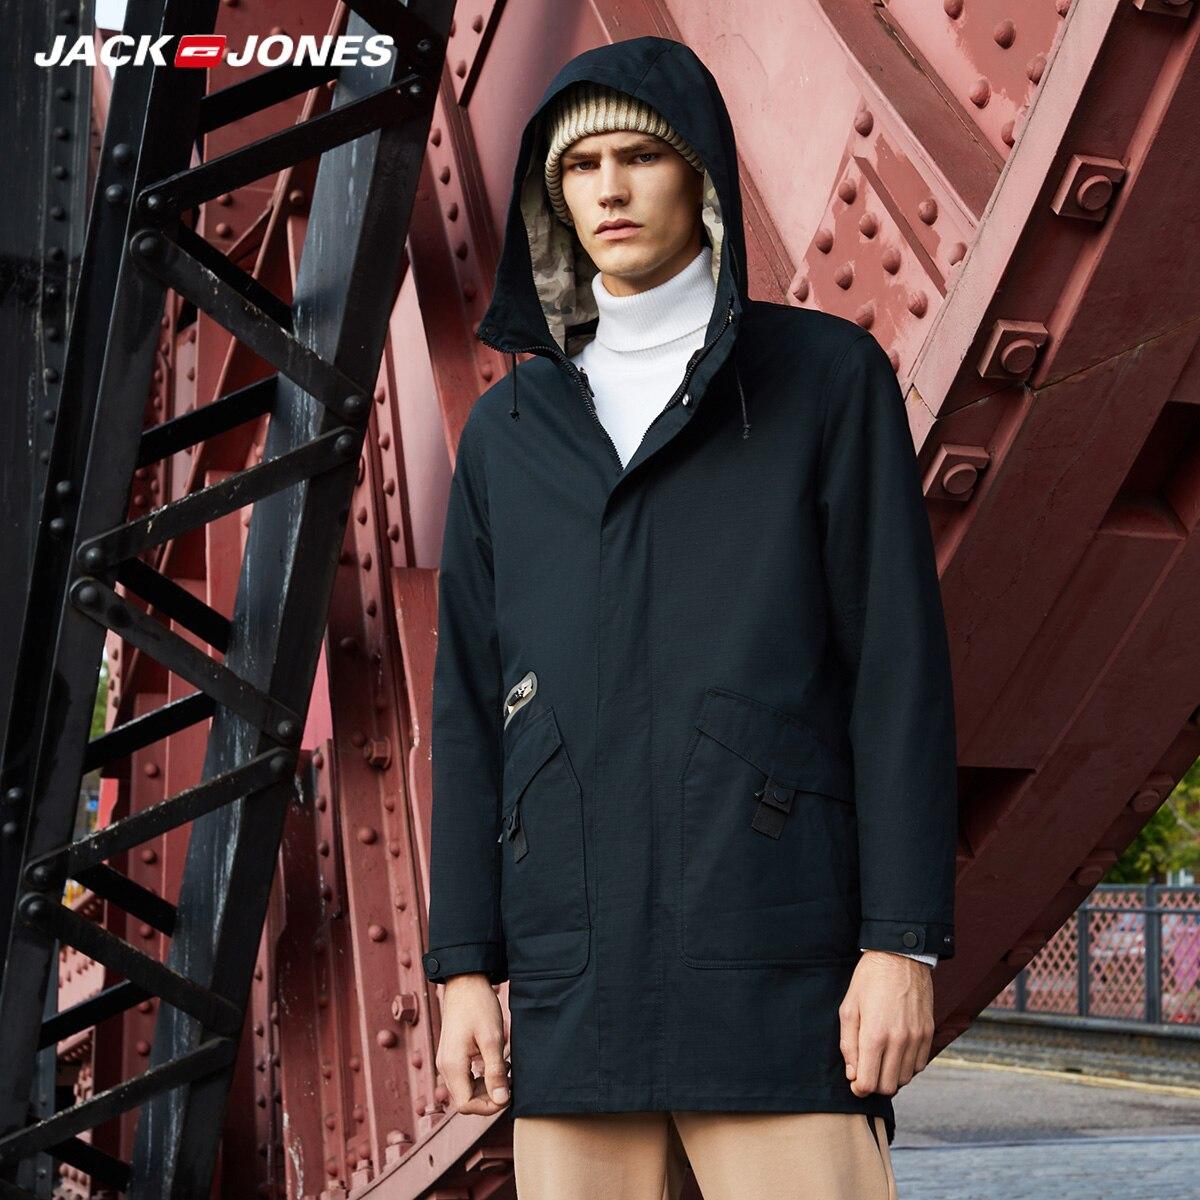 JackJones الرجال 3 في 1 معطف بركة (سترة من الفراء بقبعة للقطب الشمالي) طويلة سترة الرجال خندق معطف كلية الفاخرة الرجالية  218309518-في سترات فرائية مقلنسة من ملابس الرجال على  مجموعة 2